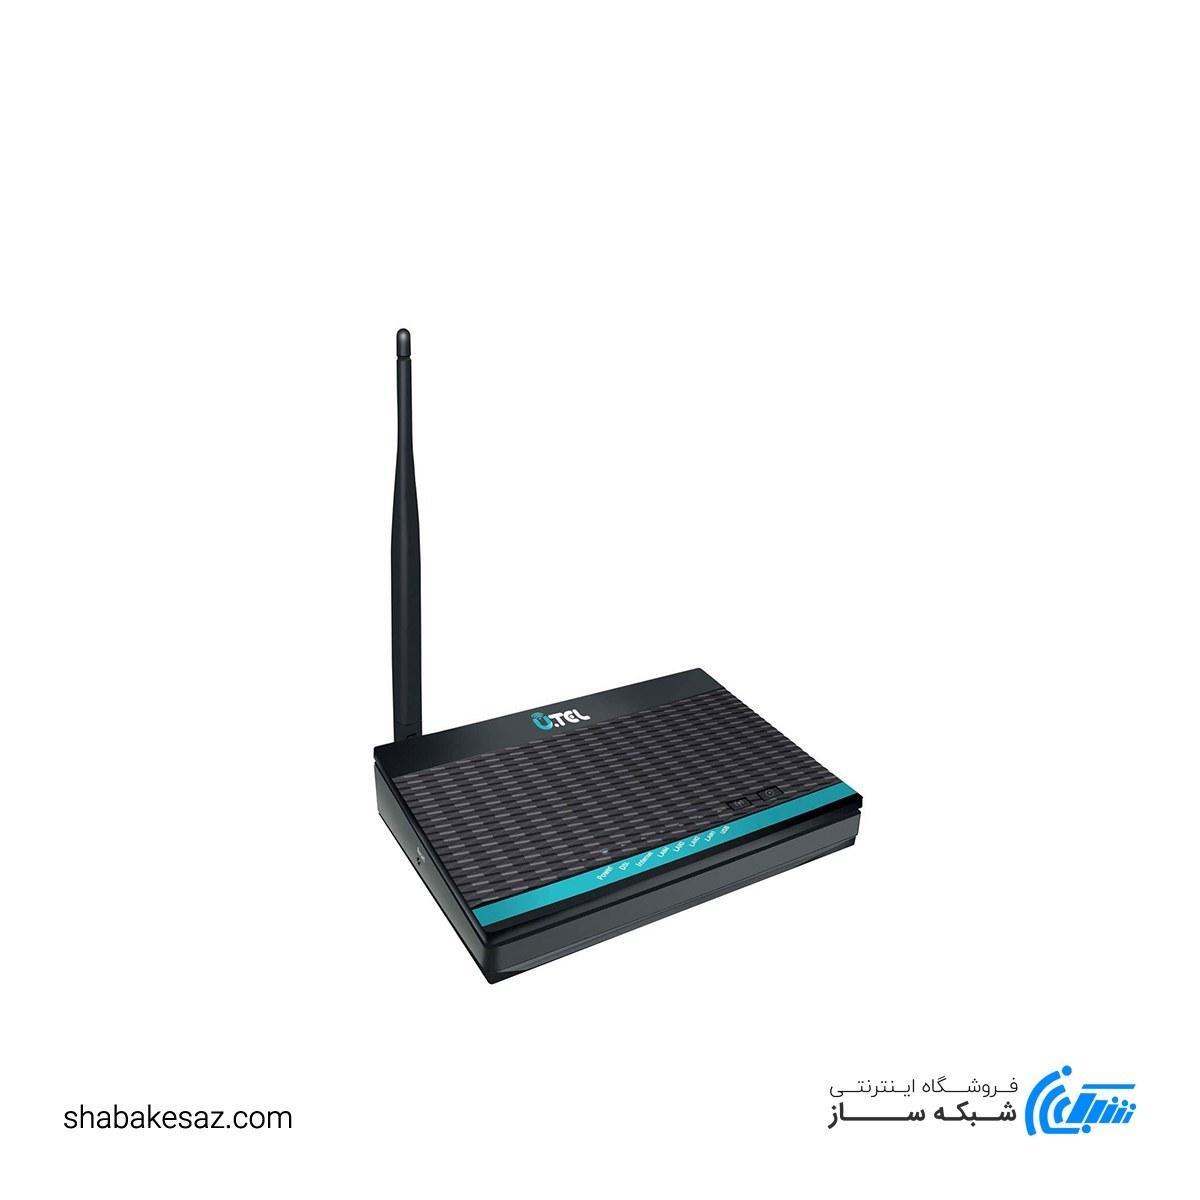 تصویر مودم ADSL N150 یوتل مدل A154